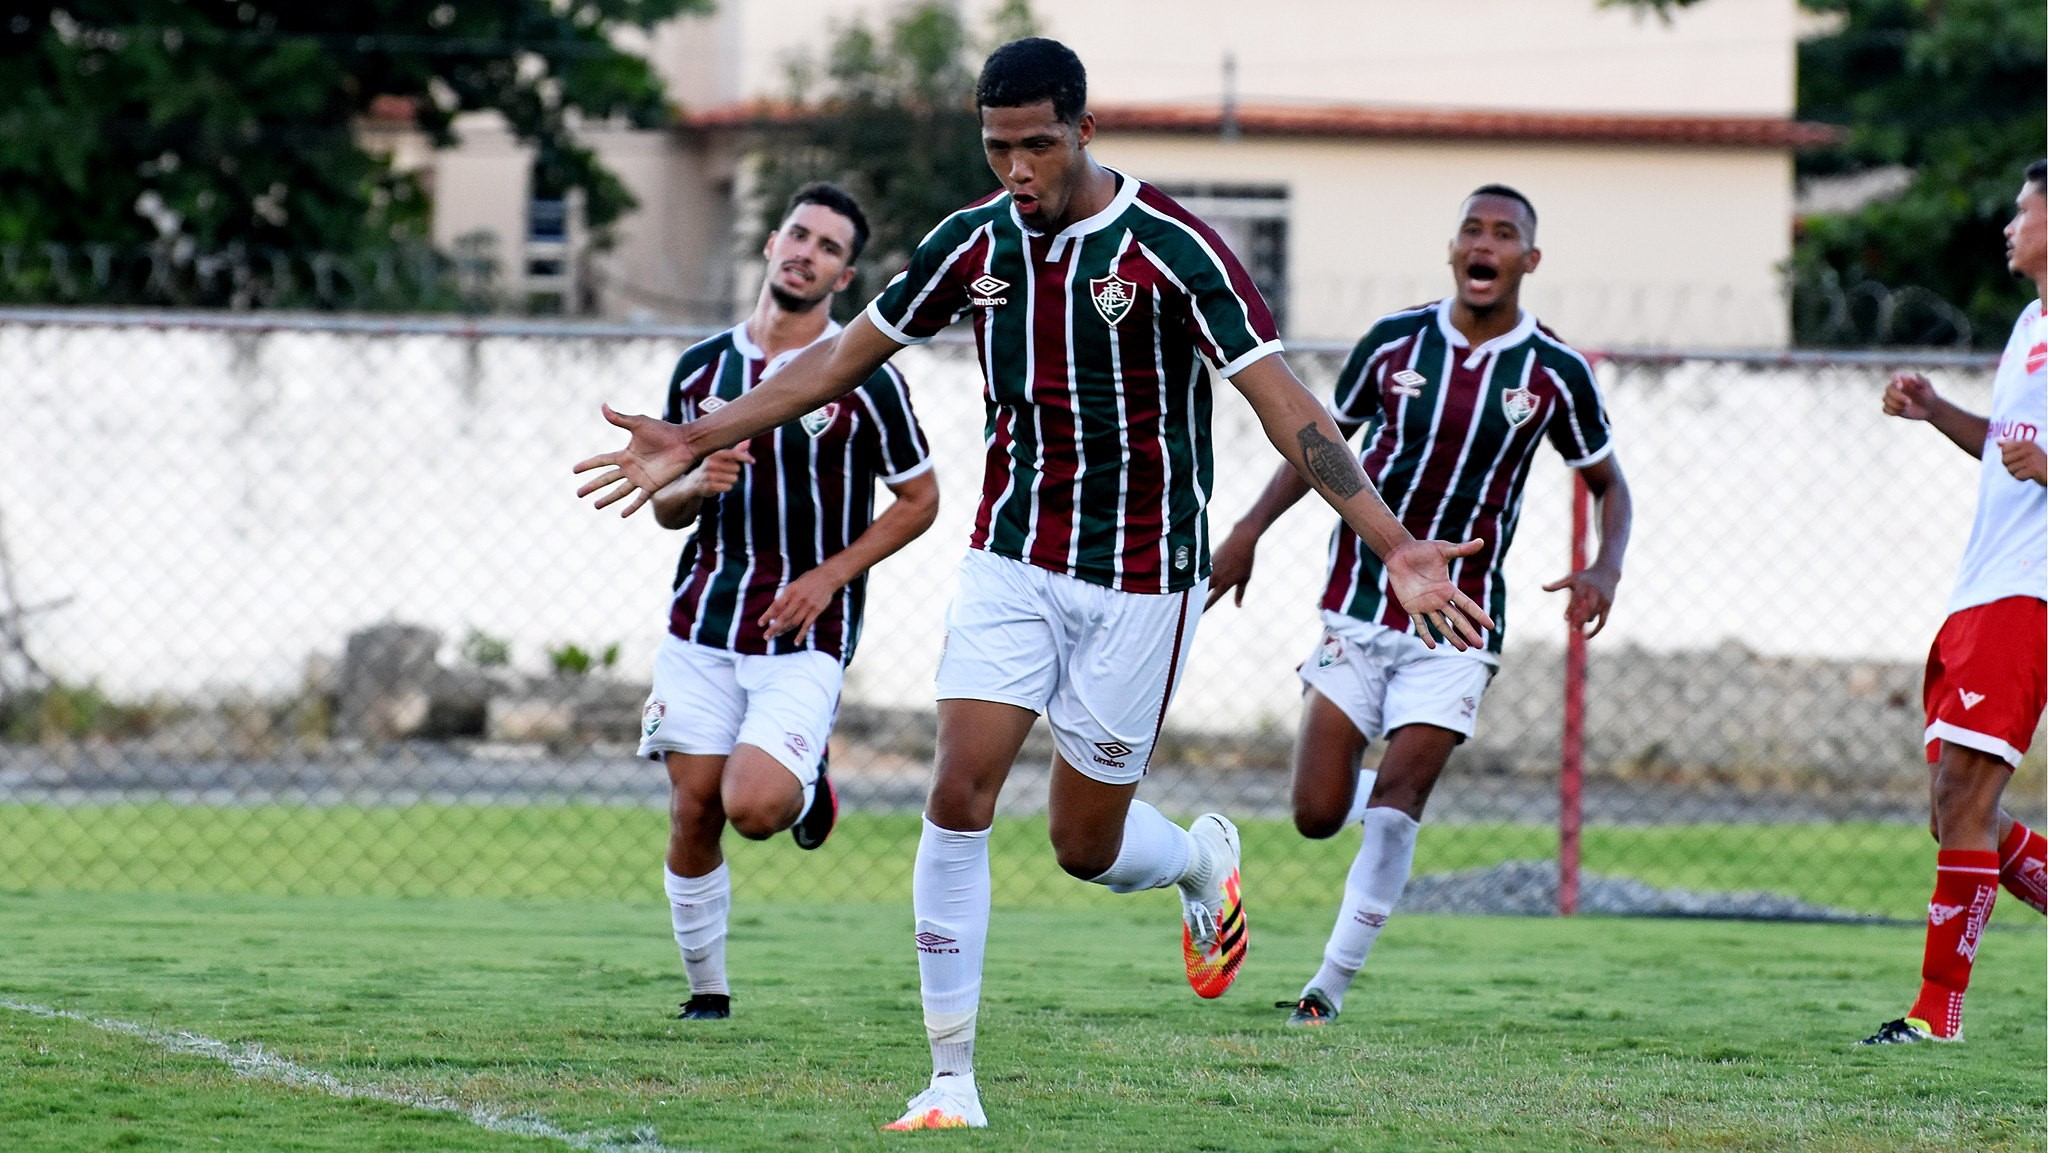 De virada, Fluminense bate Vila Nova na ida das semifinais do Brasileirão de Aspirantes